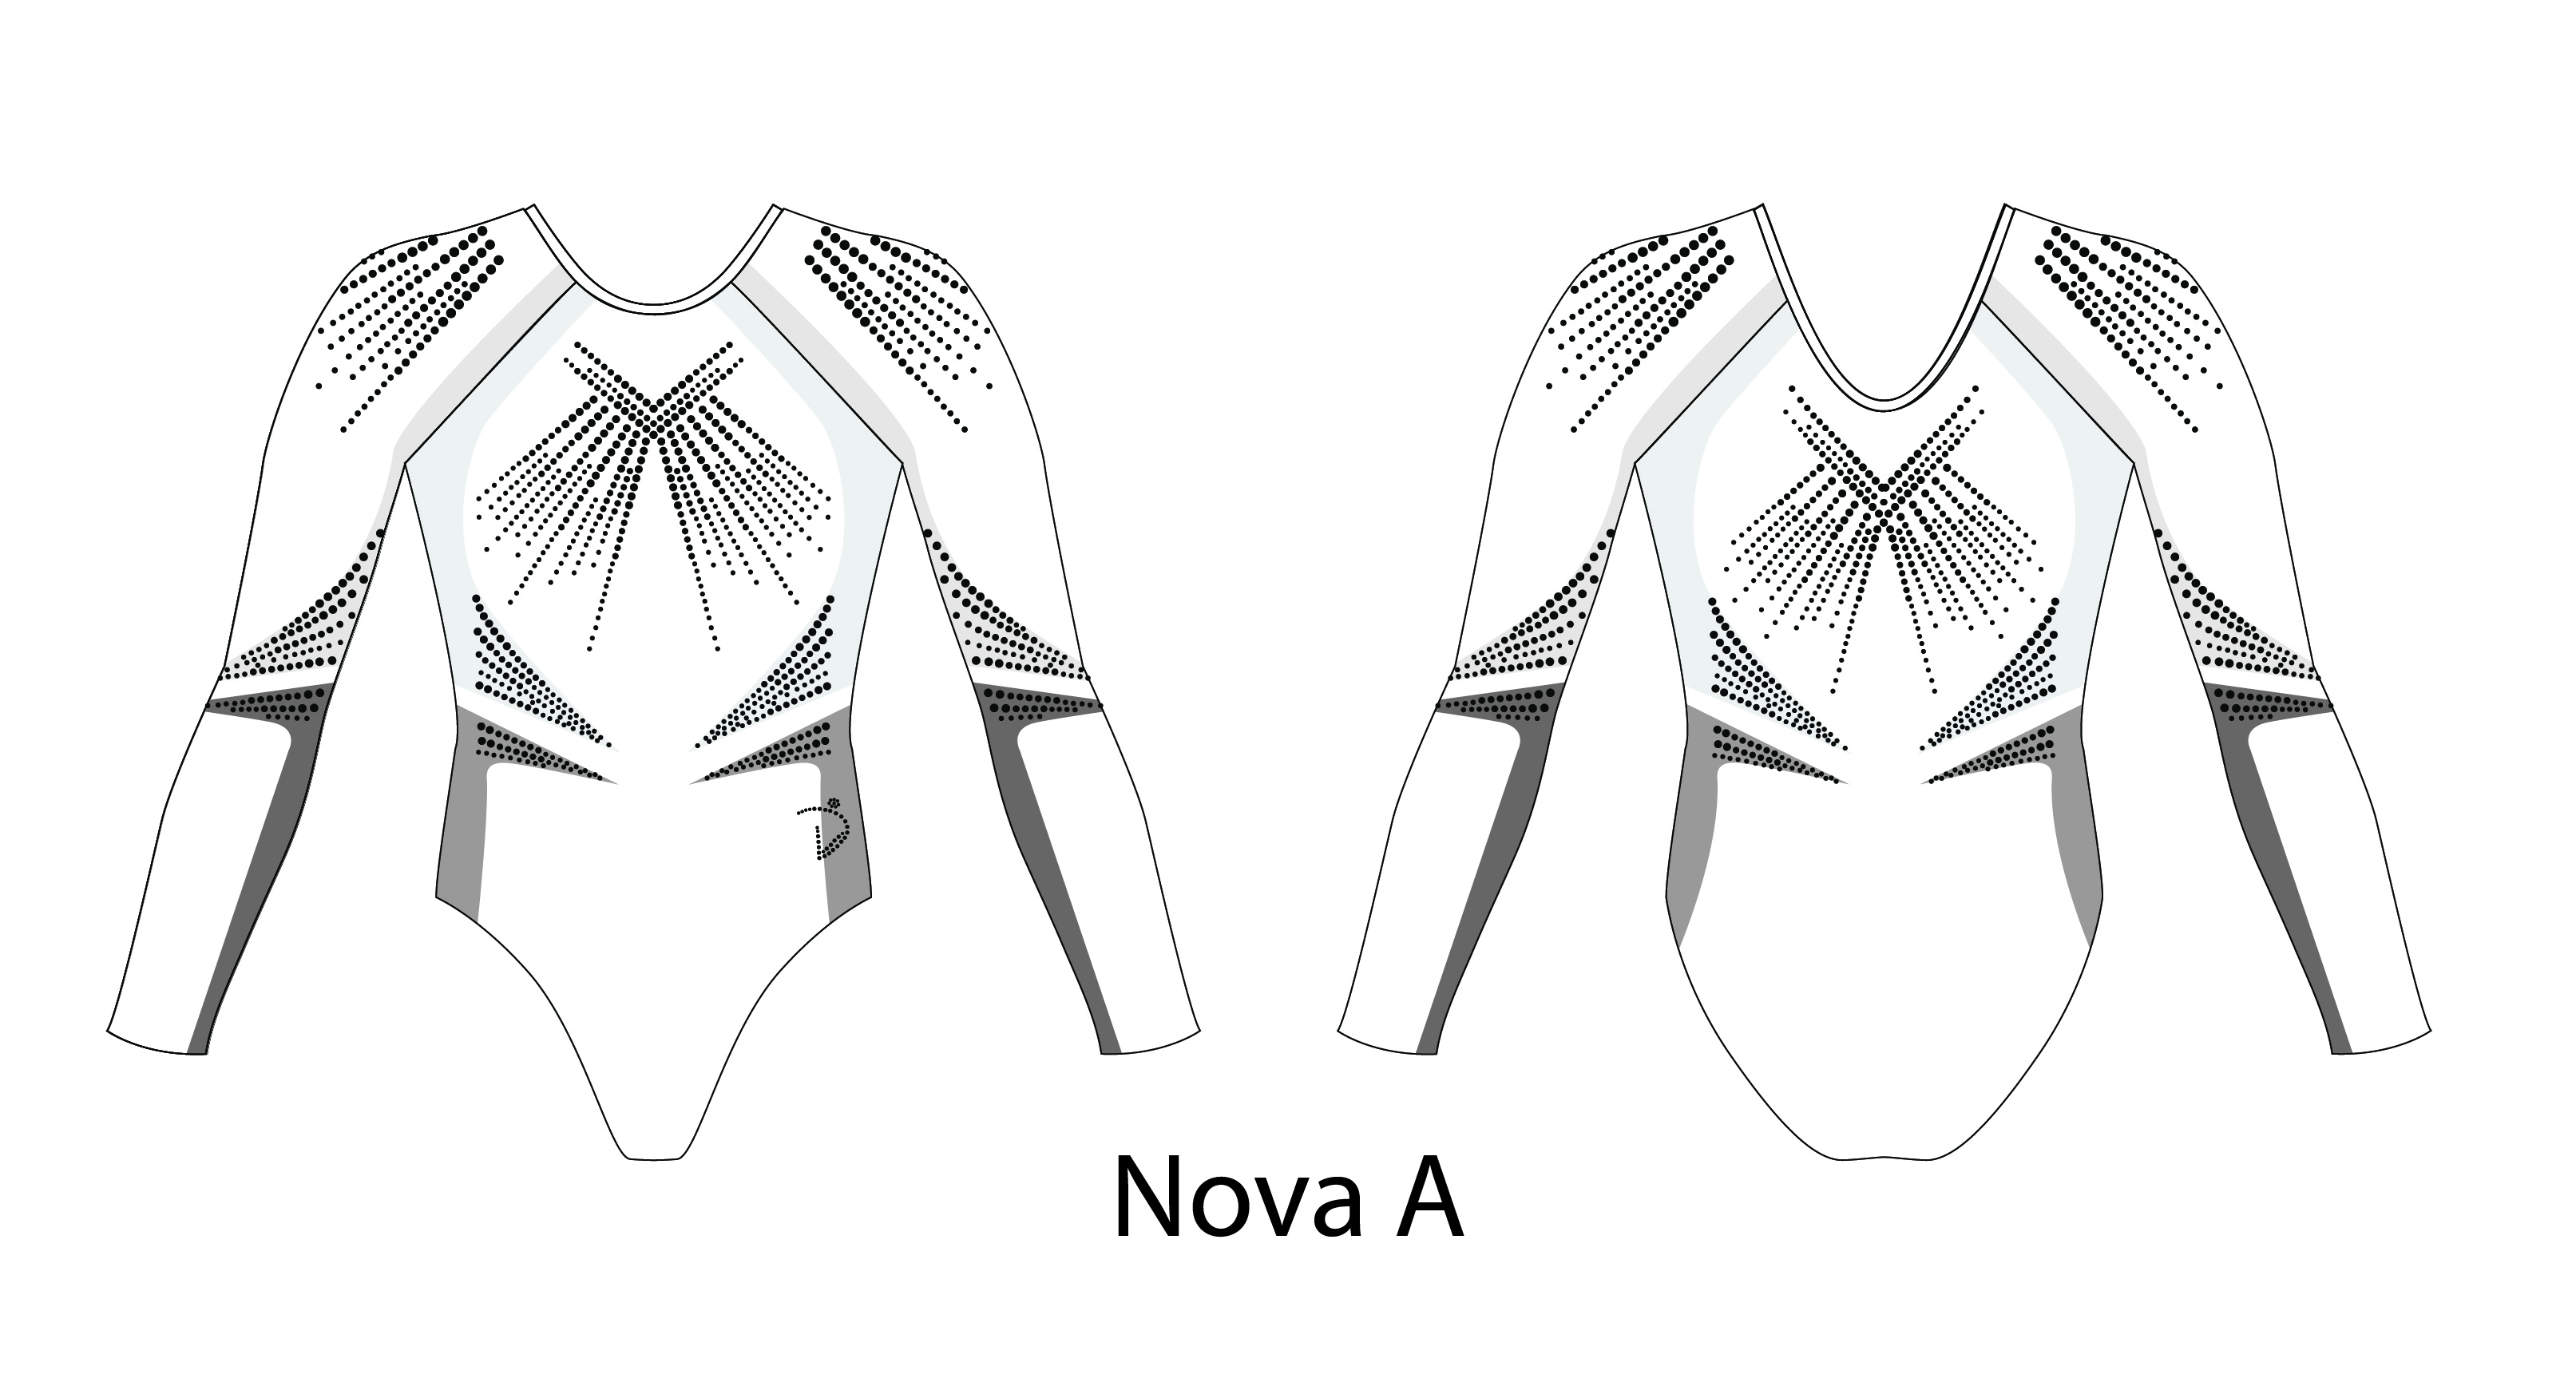 Nova A